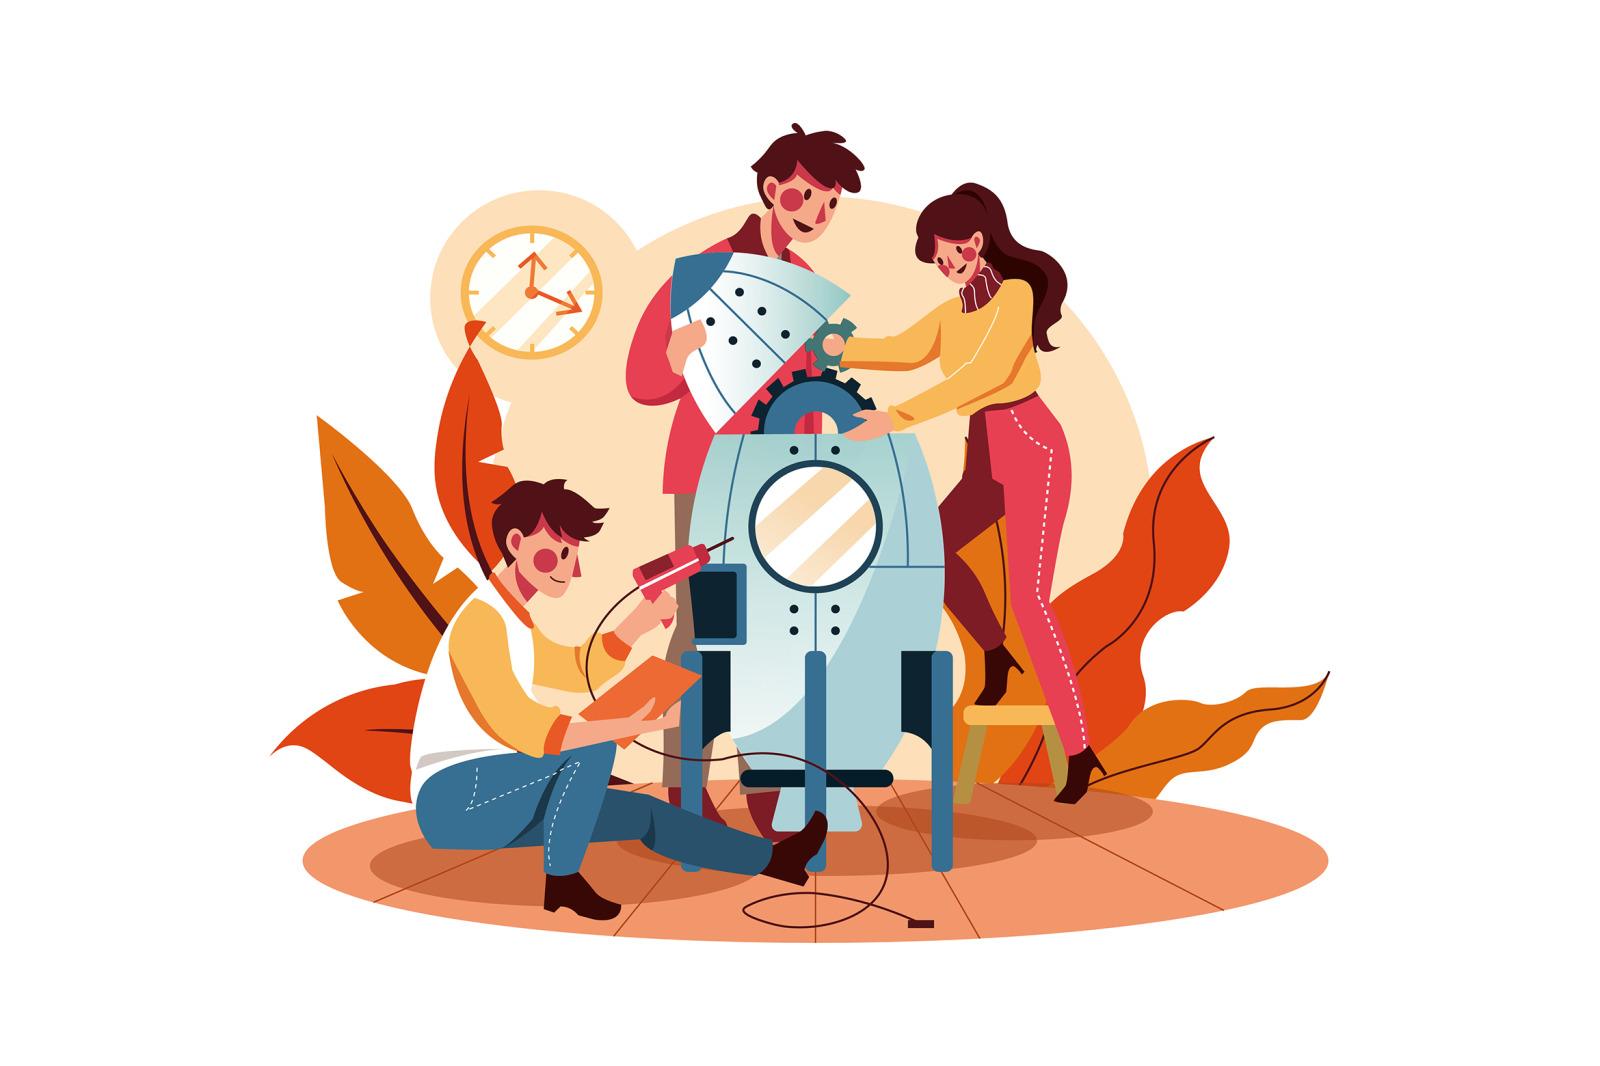 M277_Teamwork Illustrations